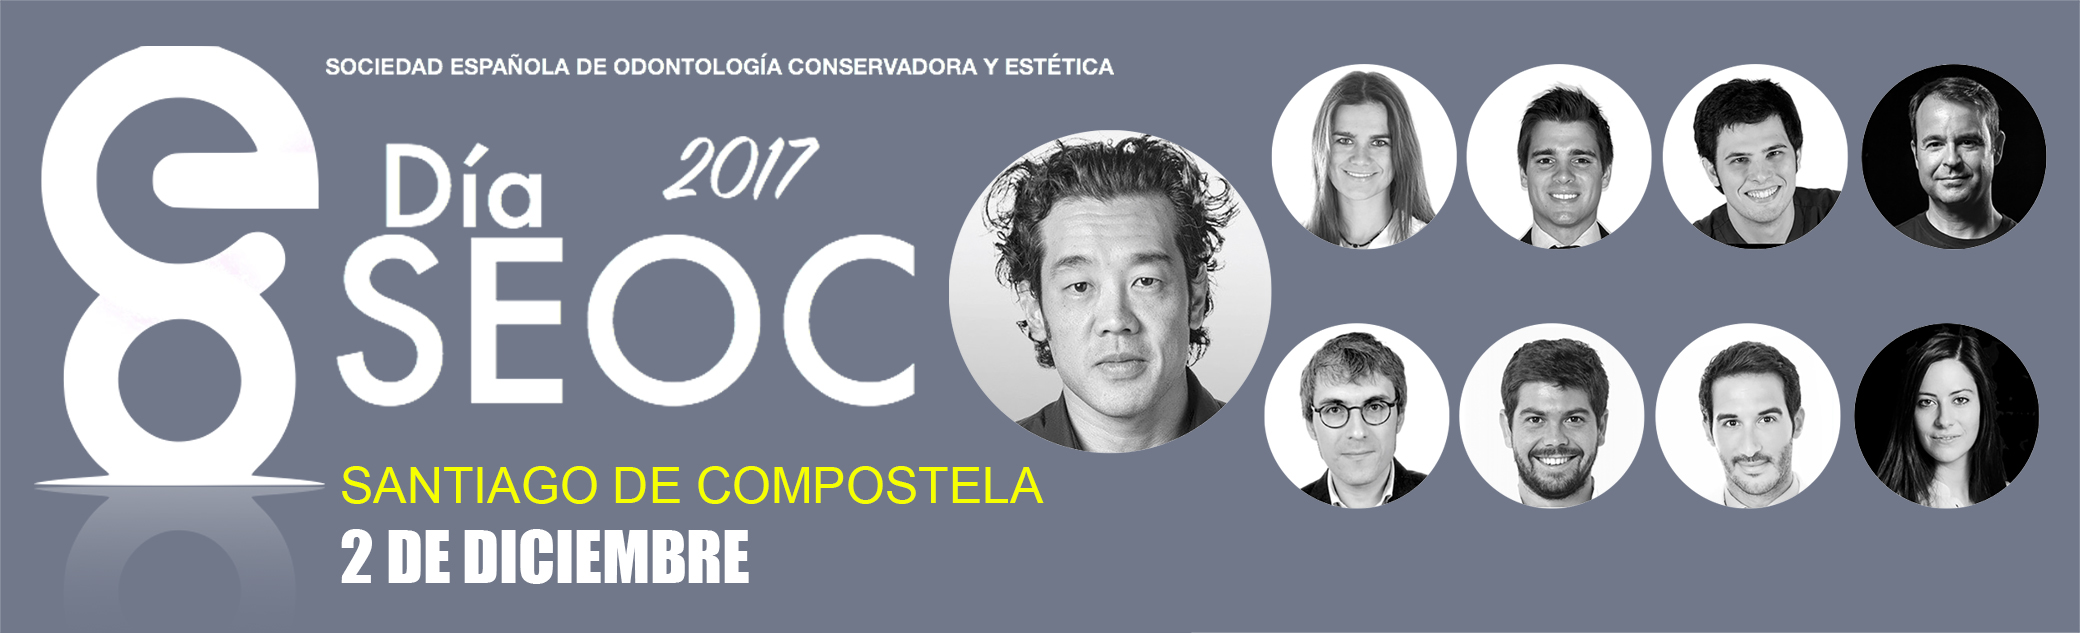 Día SEOC 2017 Santiago de Compostela_USC